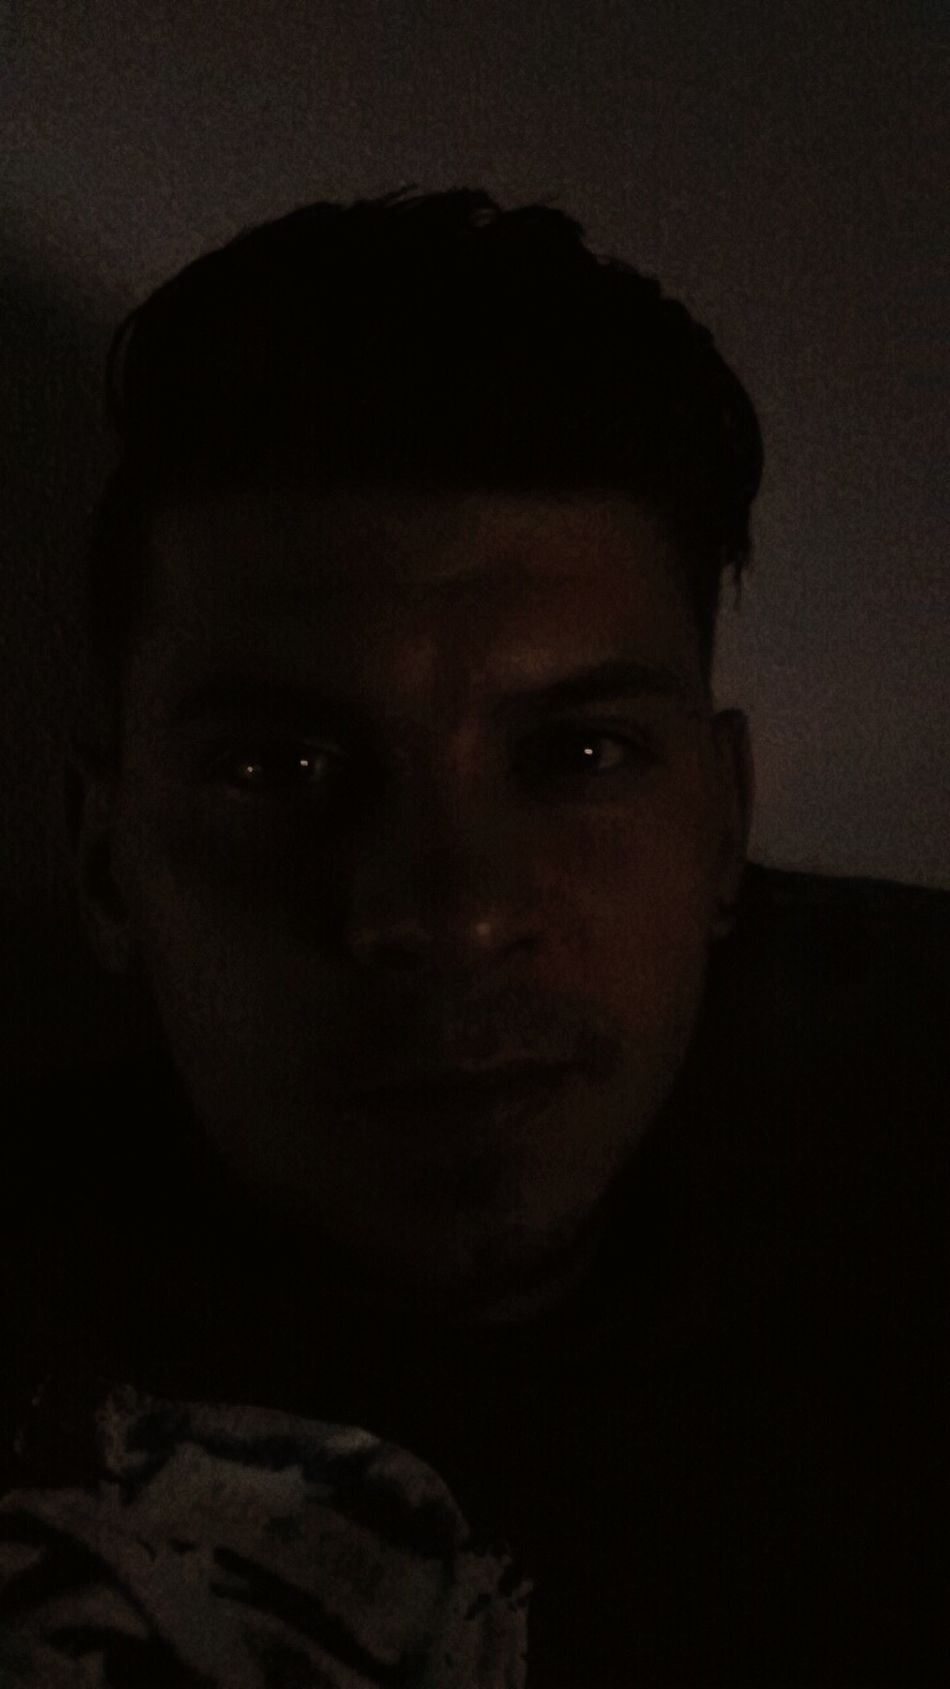 Nosleeptonight Movienight Freeday Tomorow Selfie That's Me 4eyephotography FunnyFaces